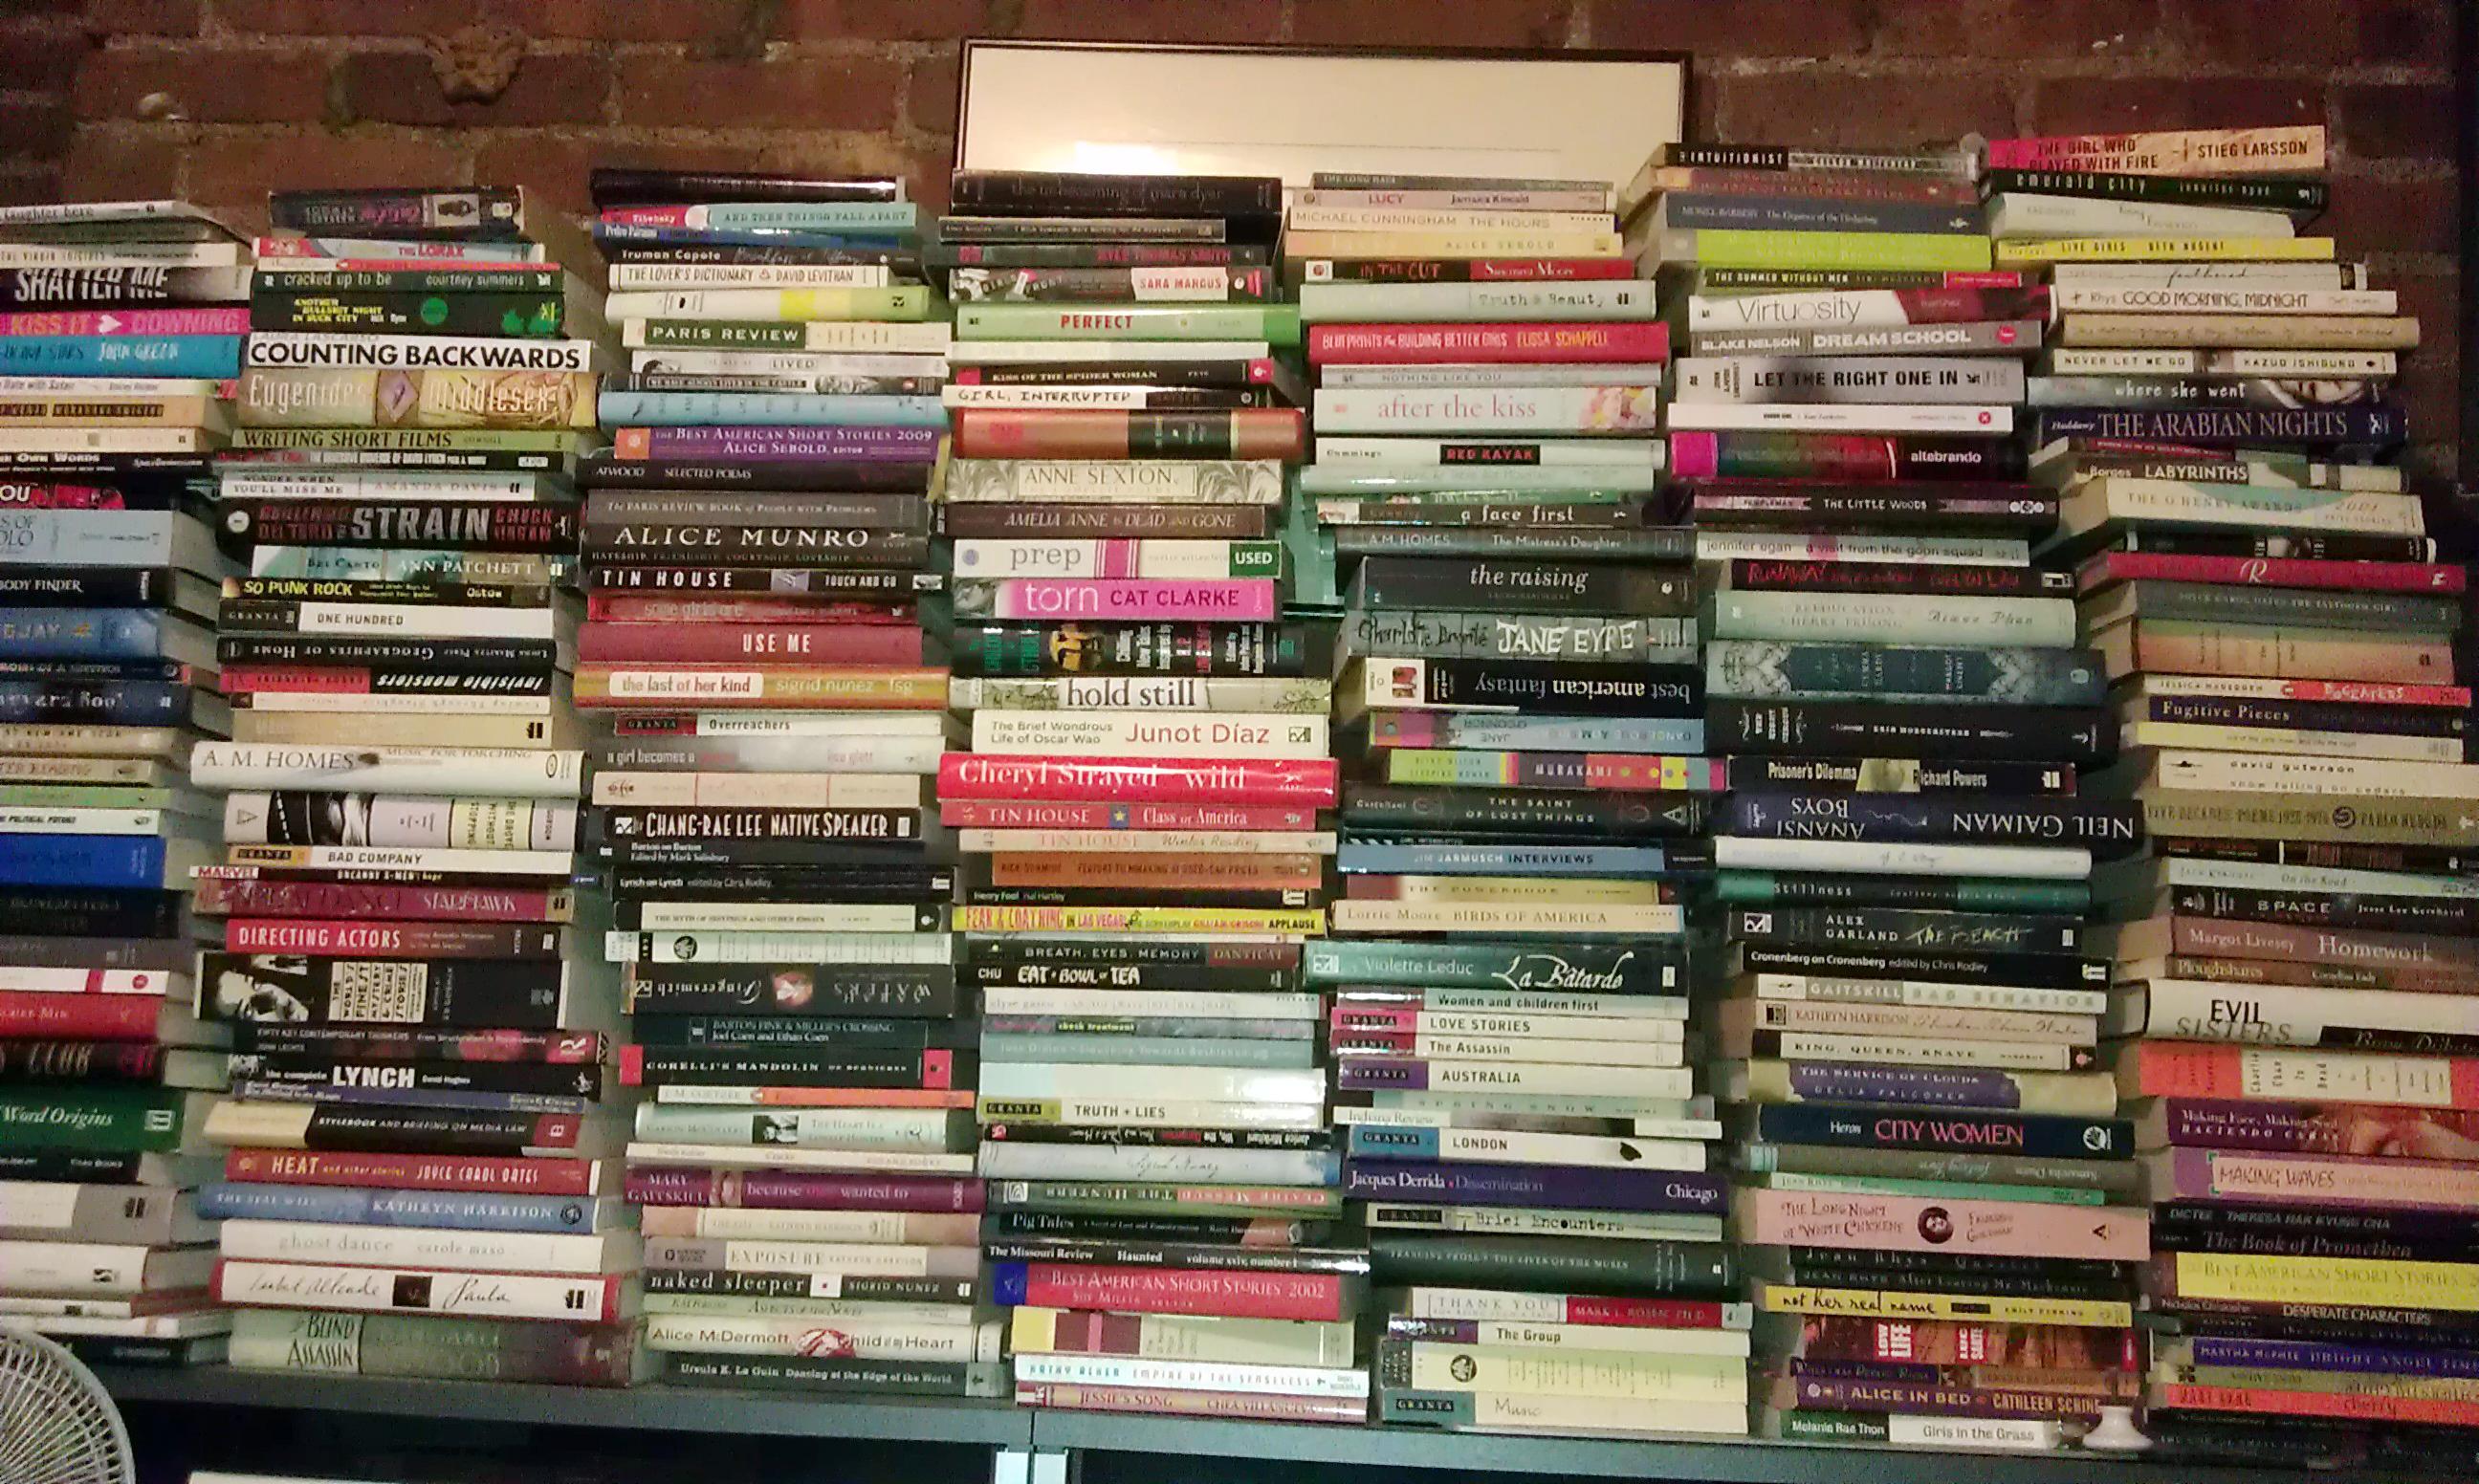 Tomorrow Debut Author Interviews Today My Unedited Bookshelf